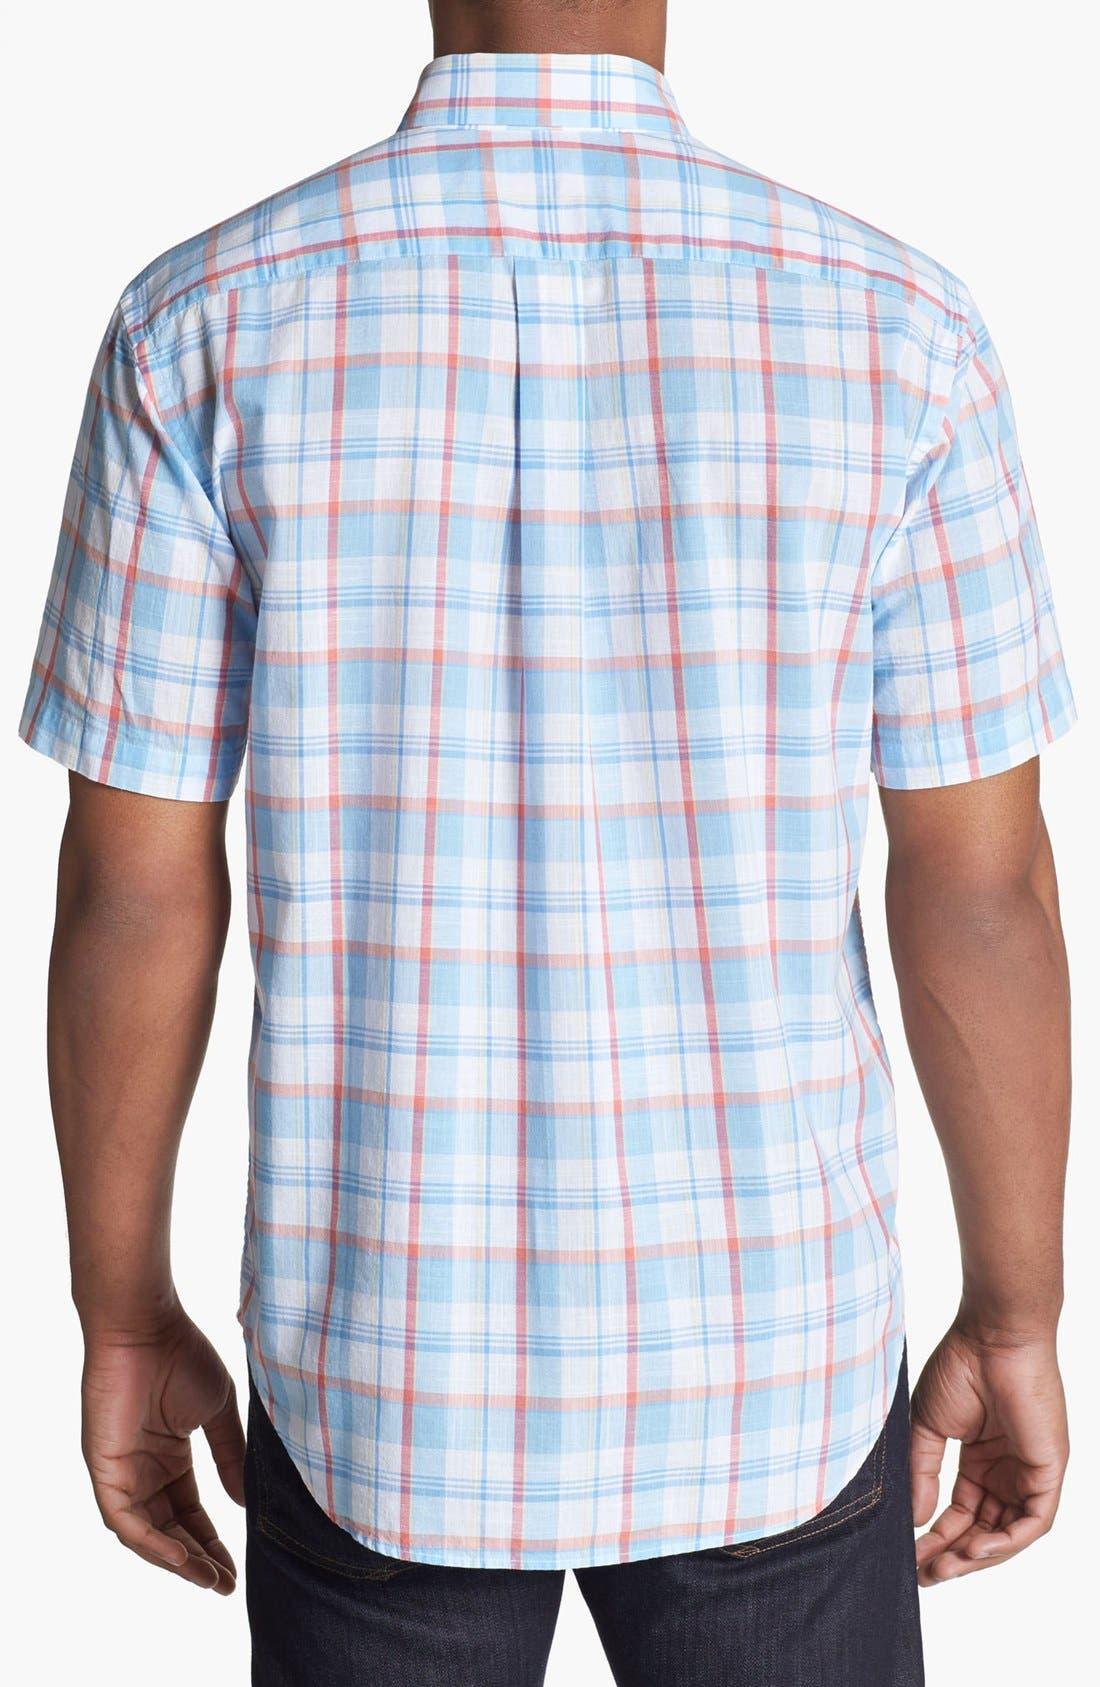 Alternate Image 2  - Vineyard Vines 'Murray' Short Sleeve Sport Shirt